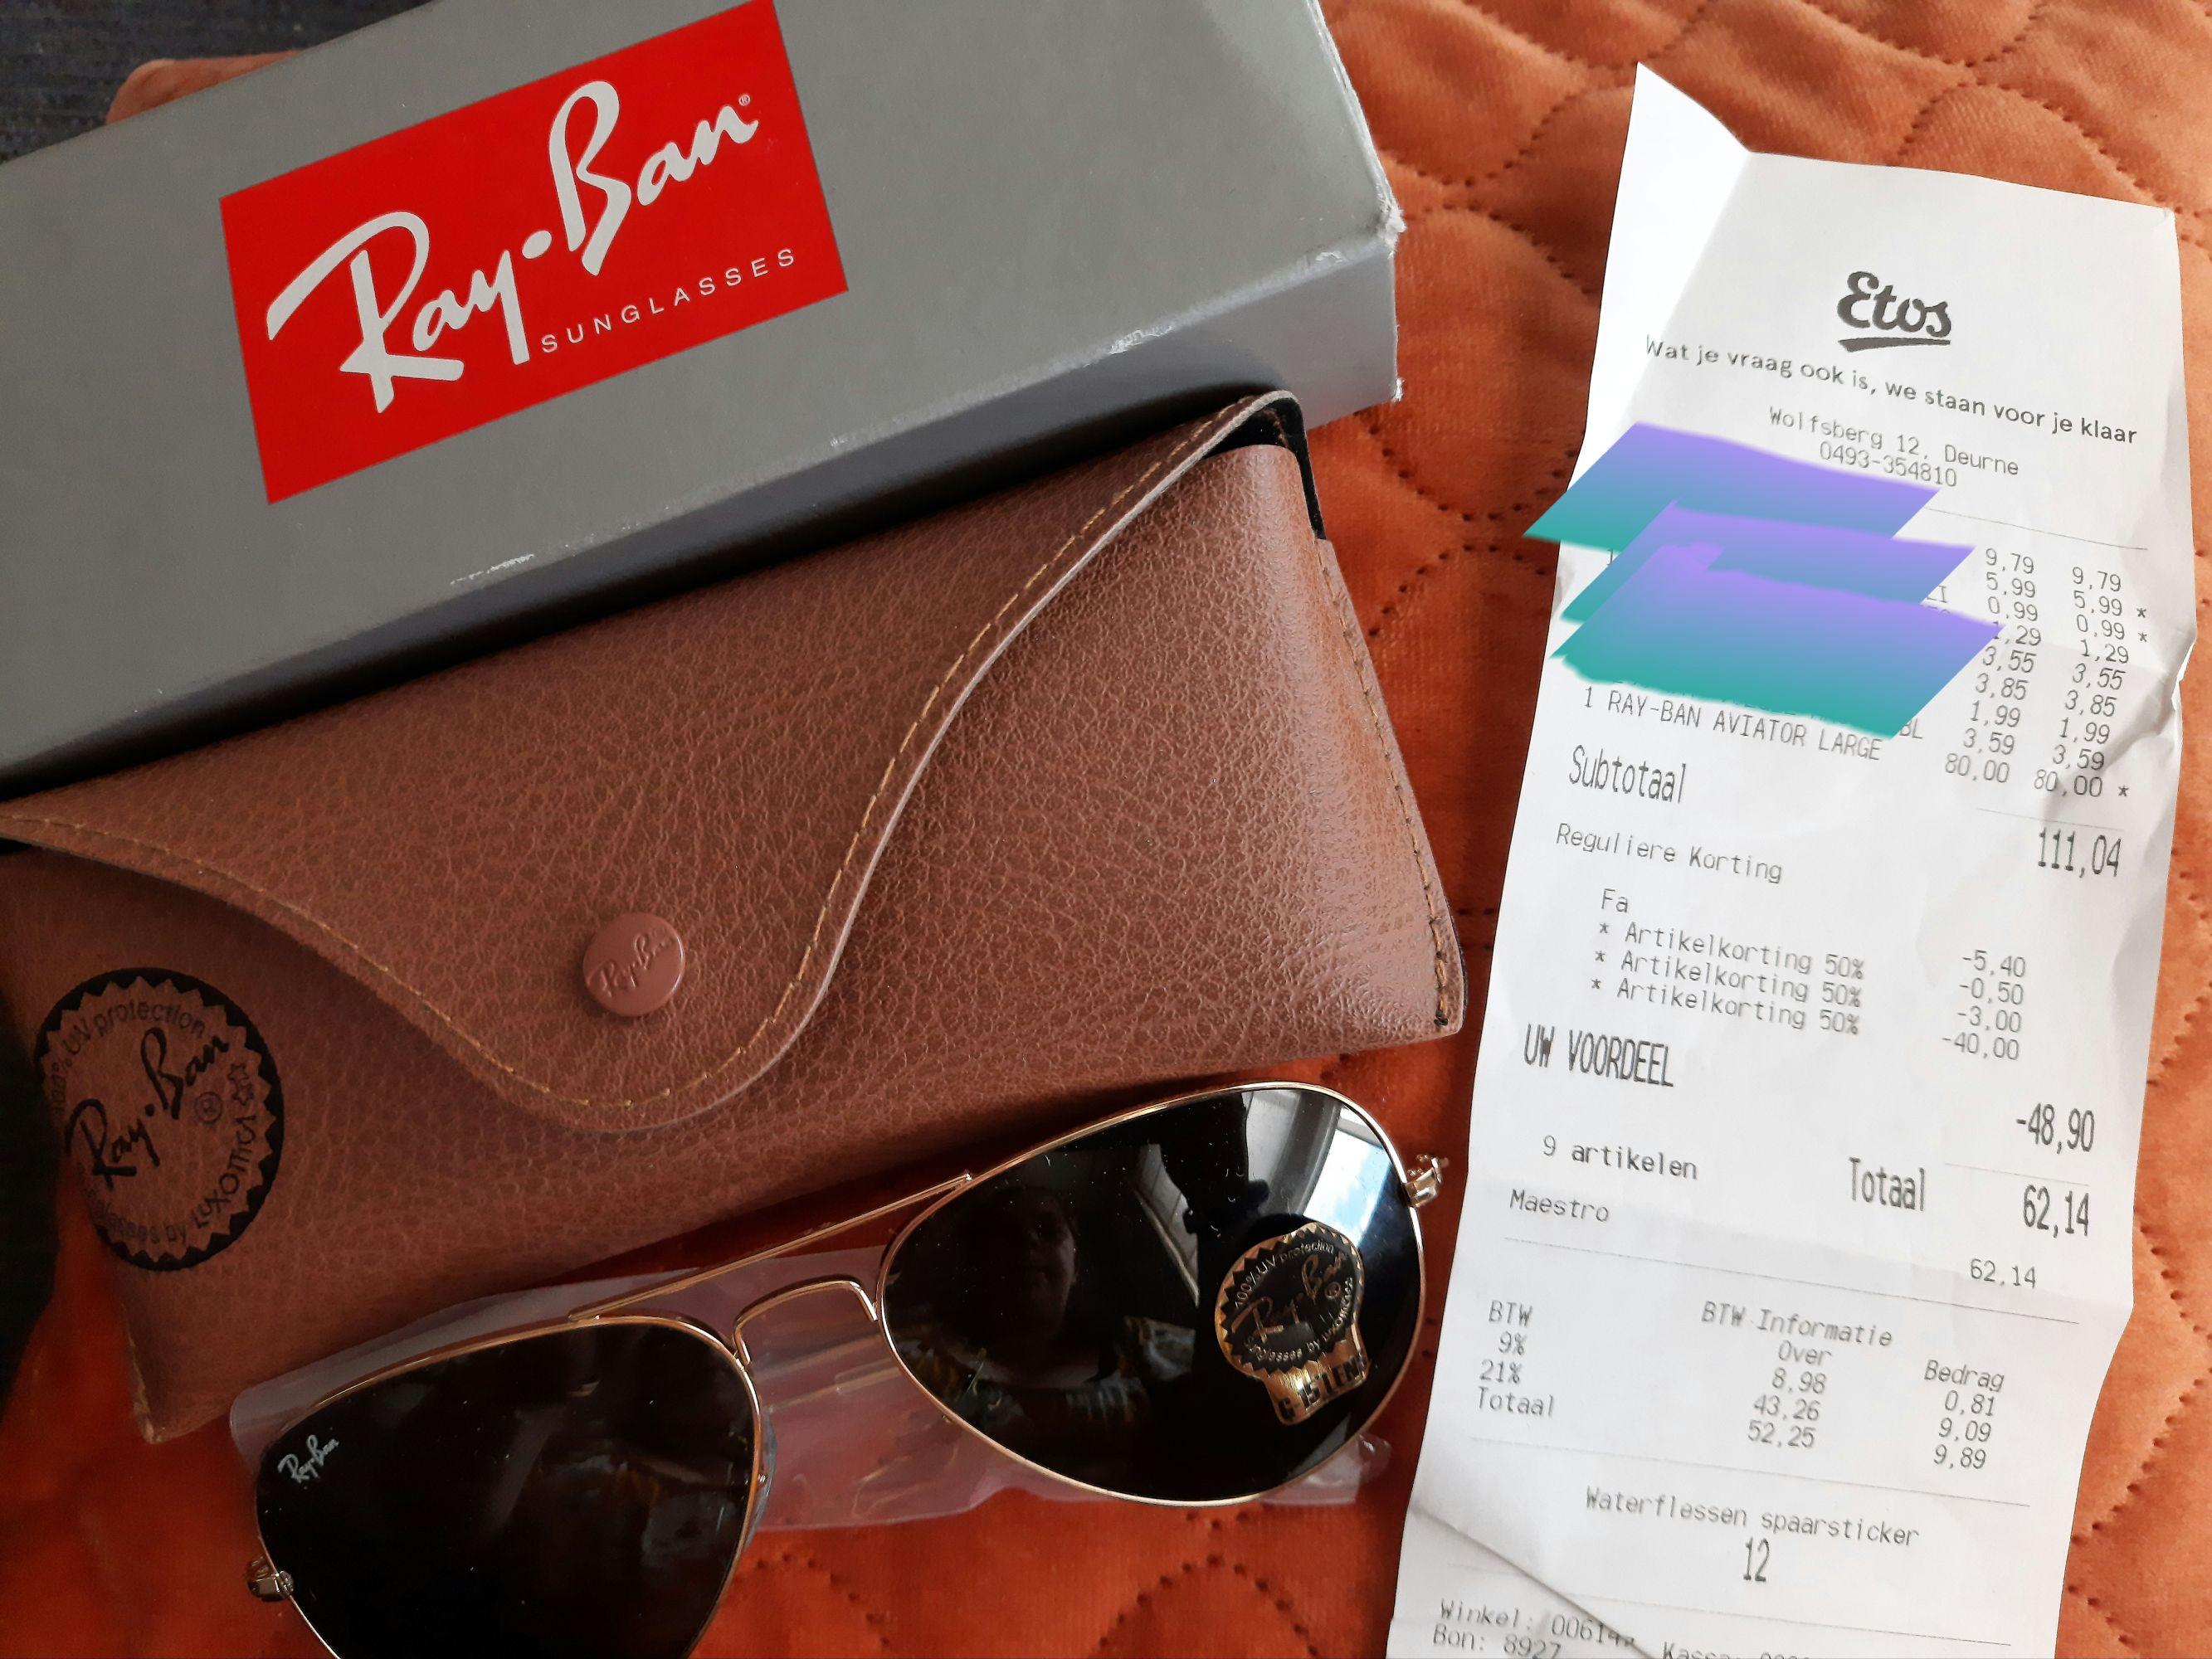 [Lokaal?] Etos- Rayban zonnebrillen Aviator & Wayfarer 50% - 40 euro